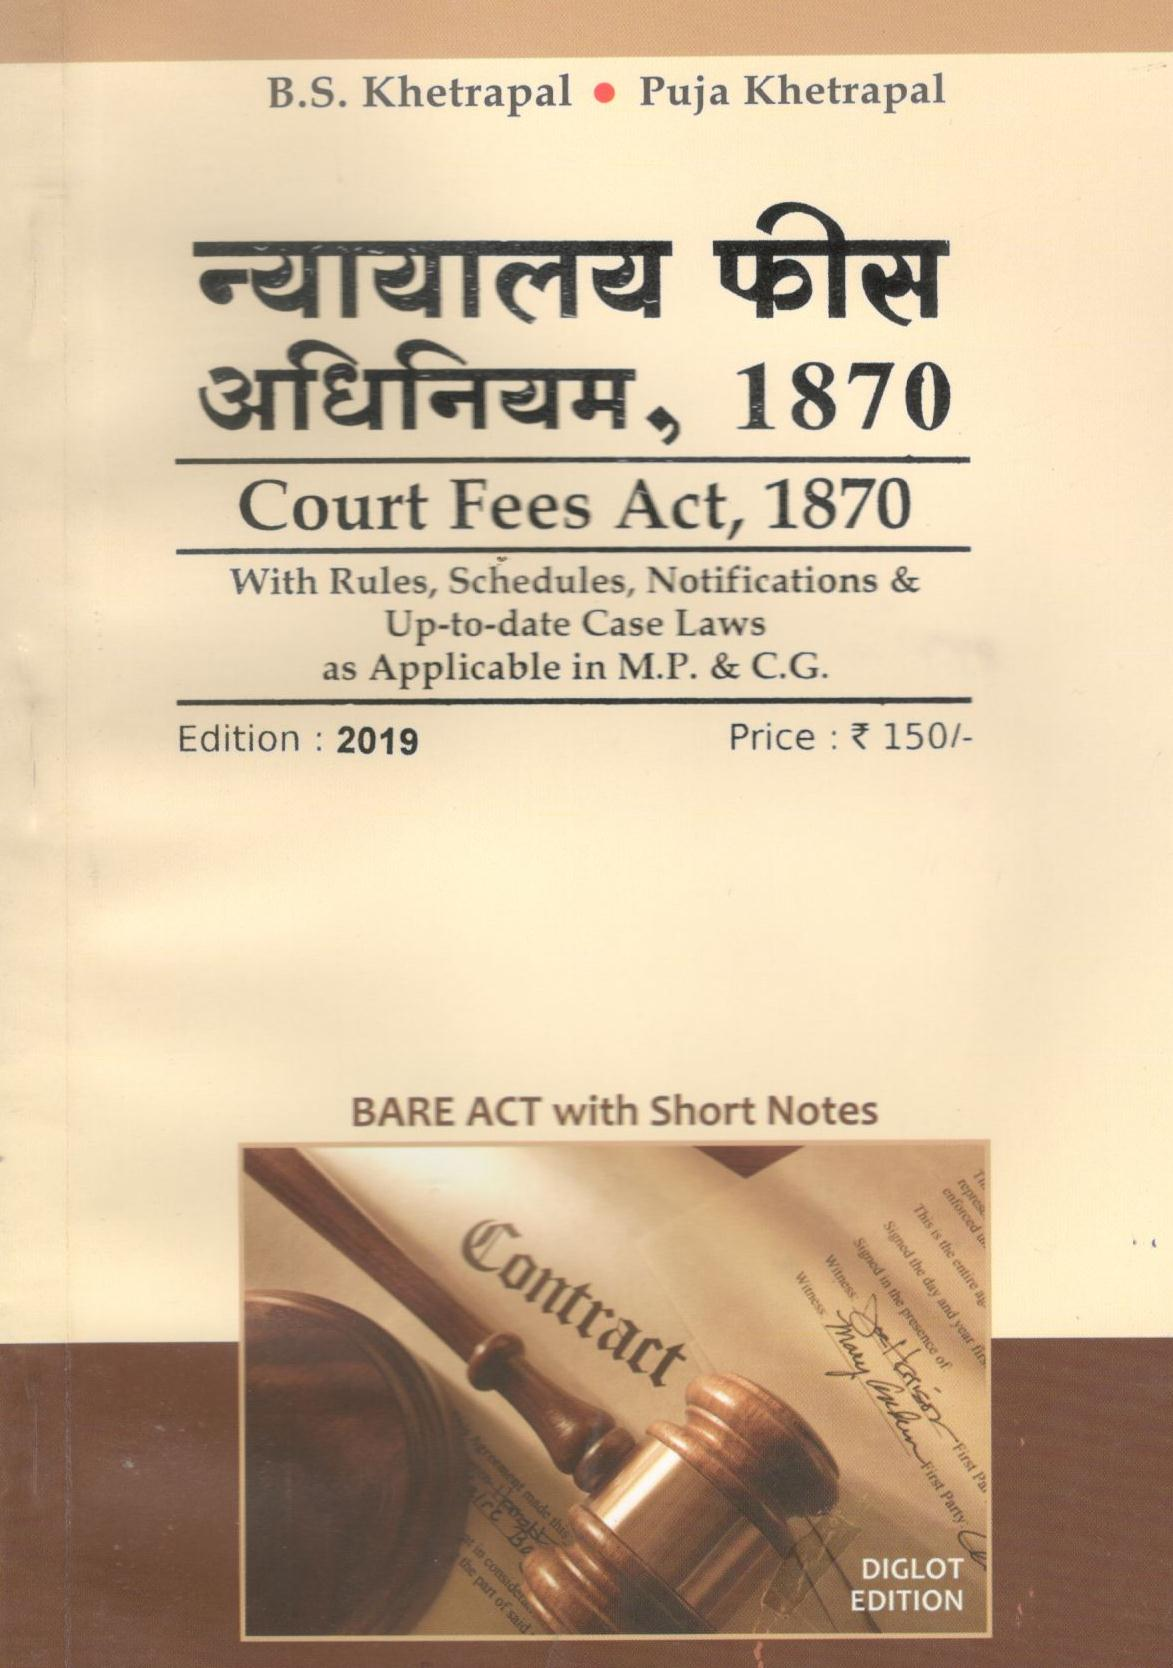 न्यायालय फीस अधिनियम, 1870 / Court fees Act, 1870